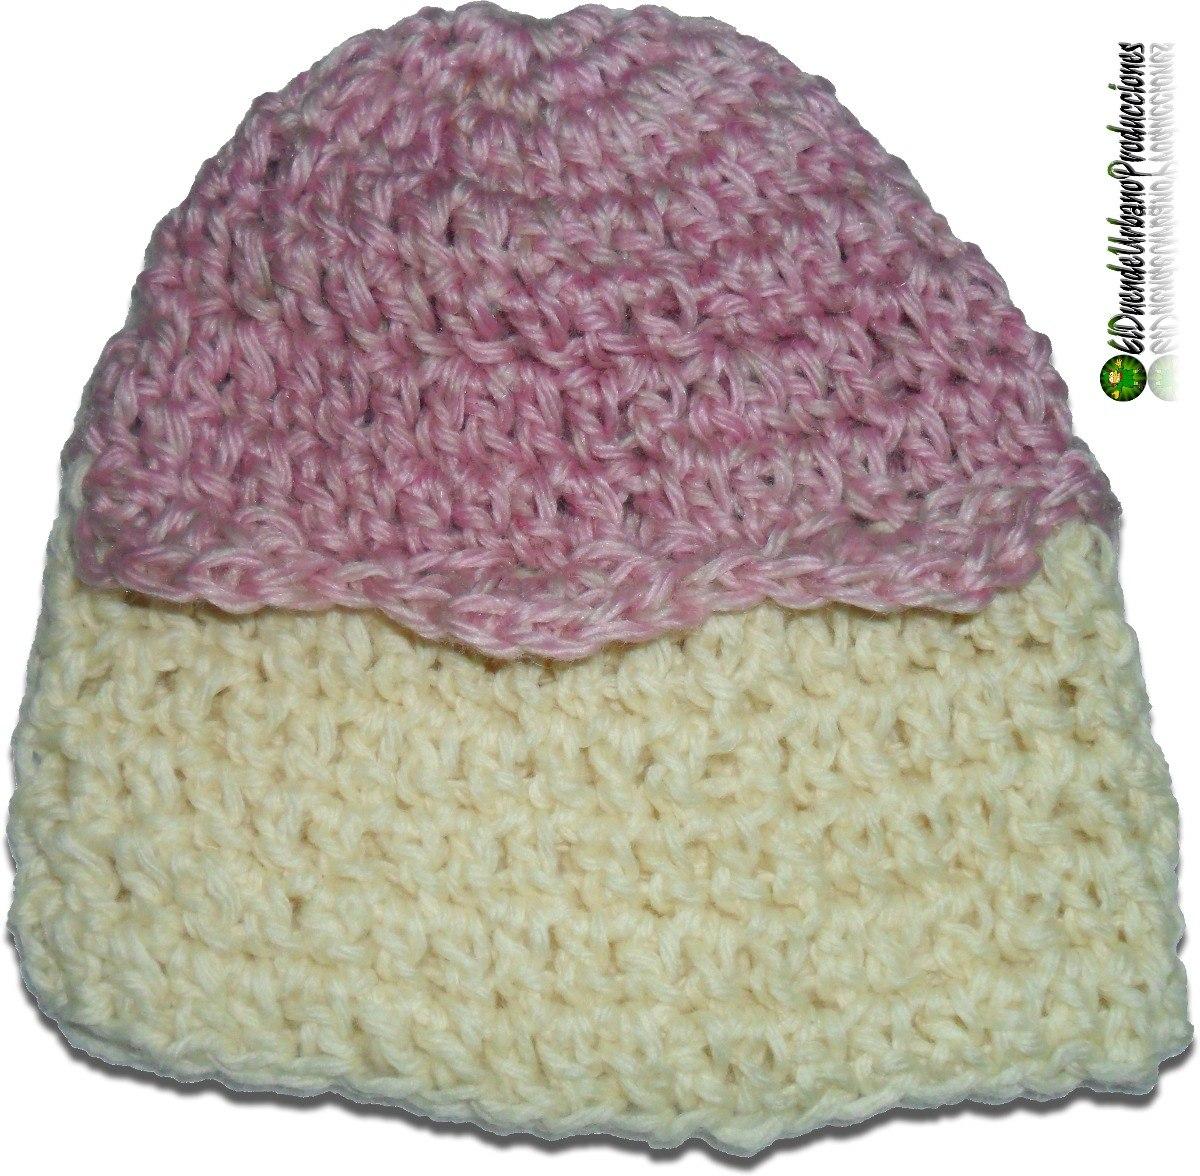 a31b5b33f gorros infantiles tejidos crochet unisex mod rosa con onda. Cargando zoom.